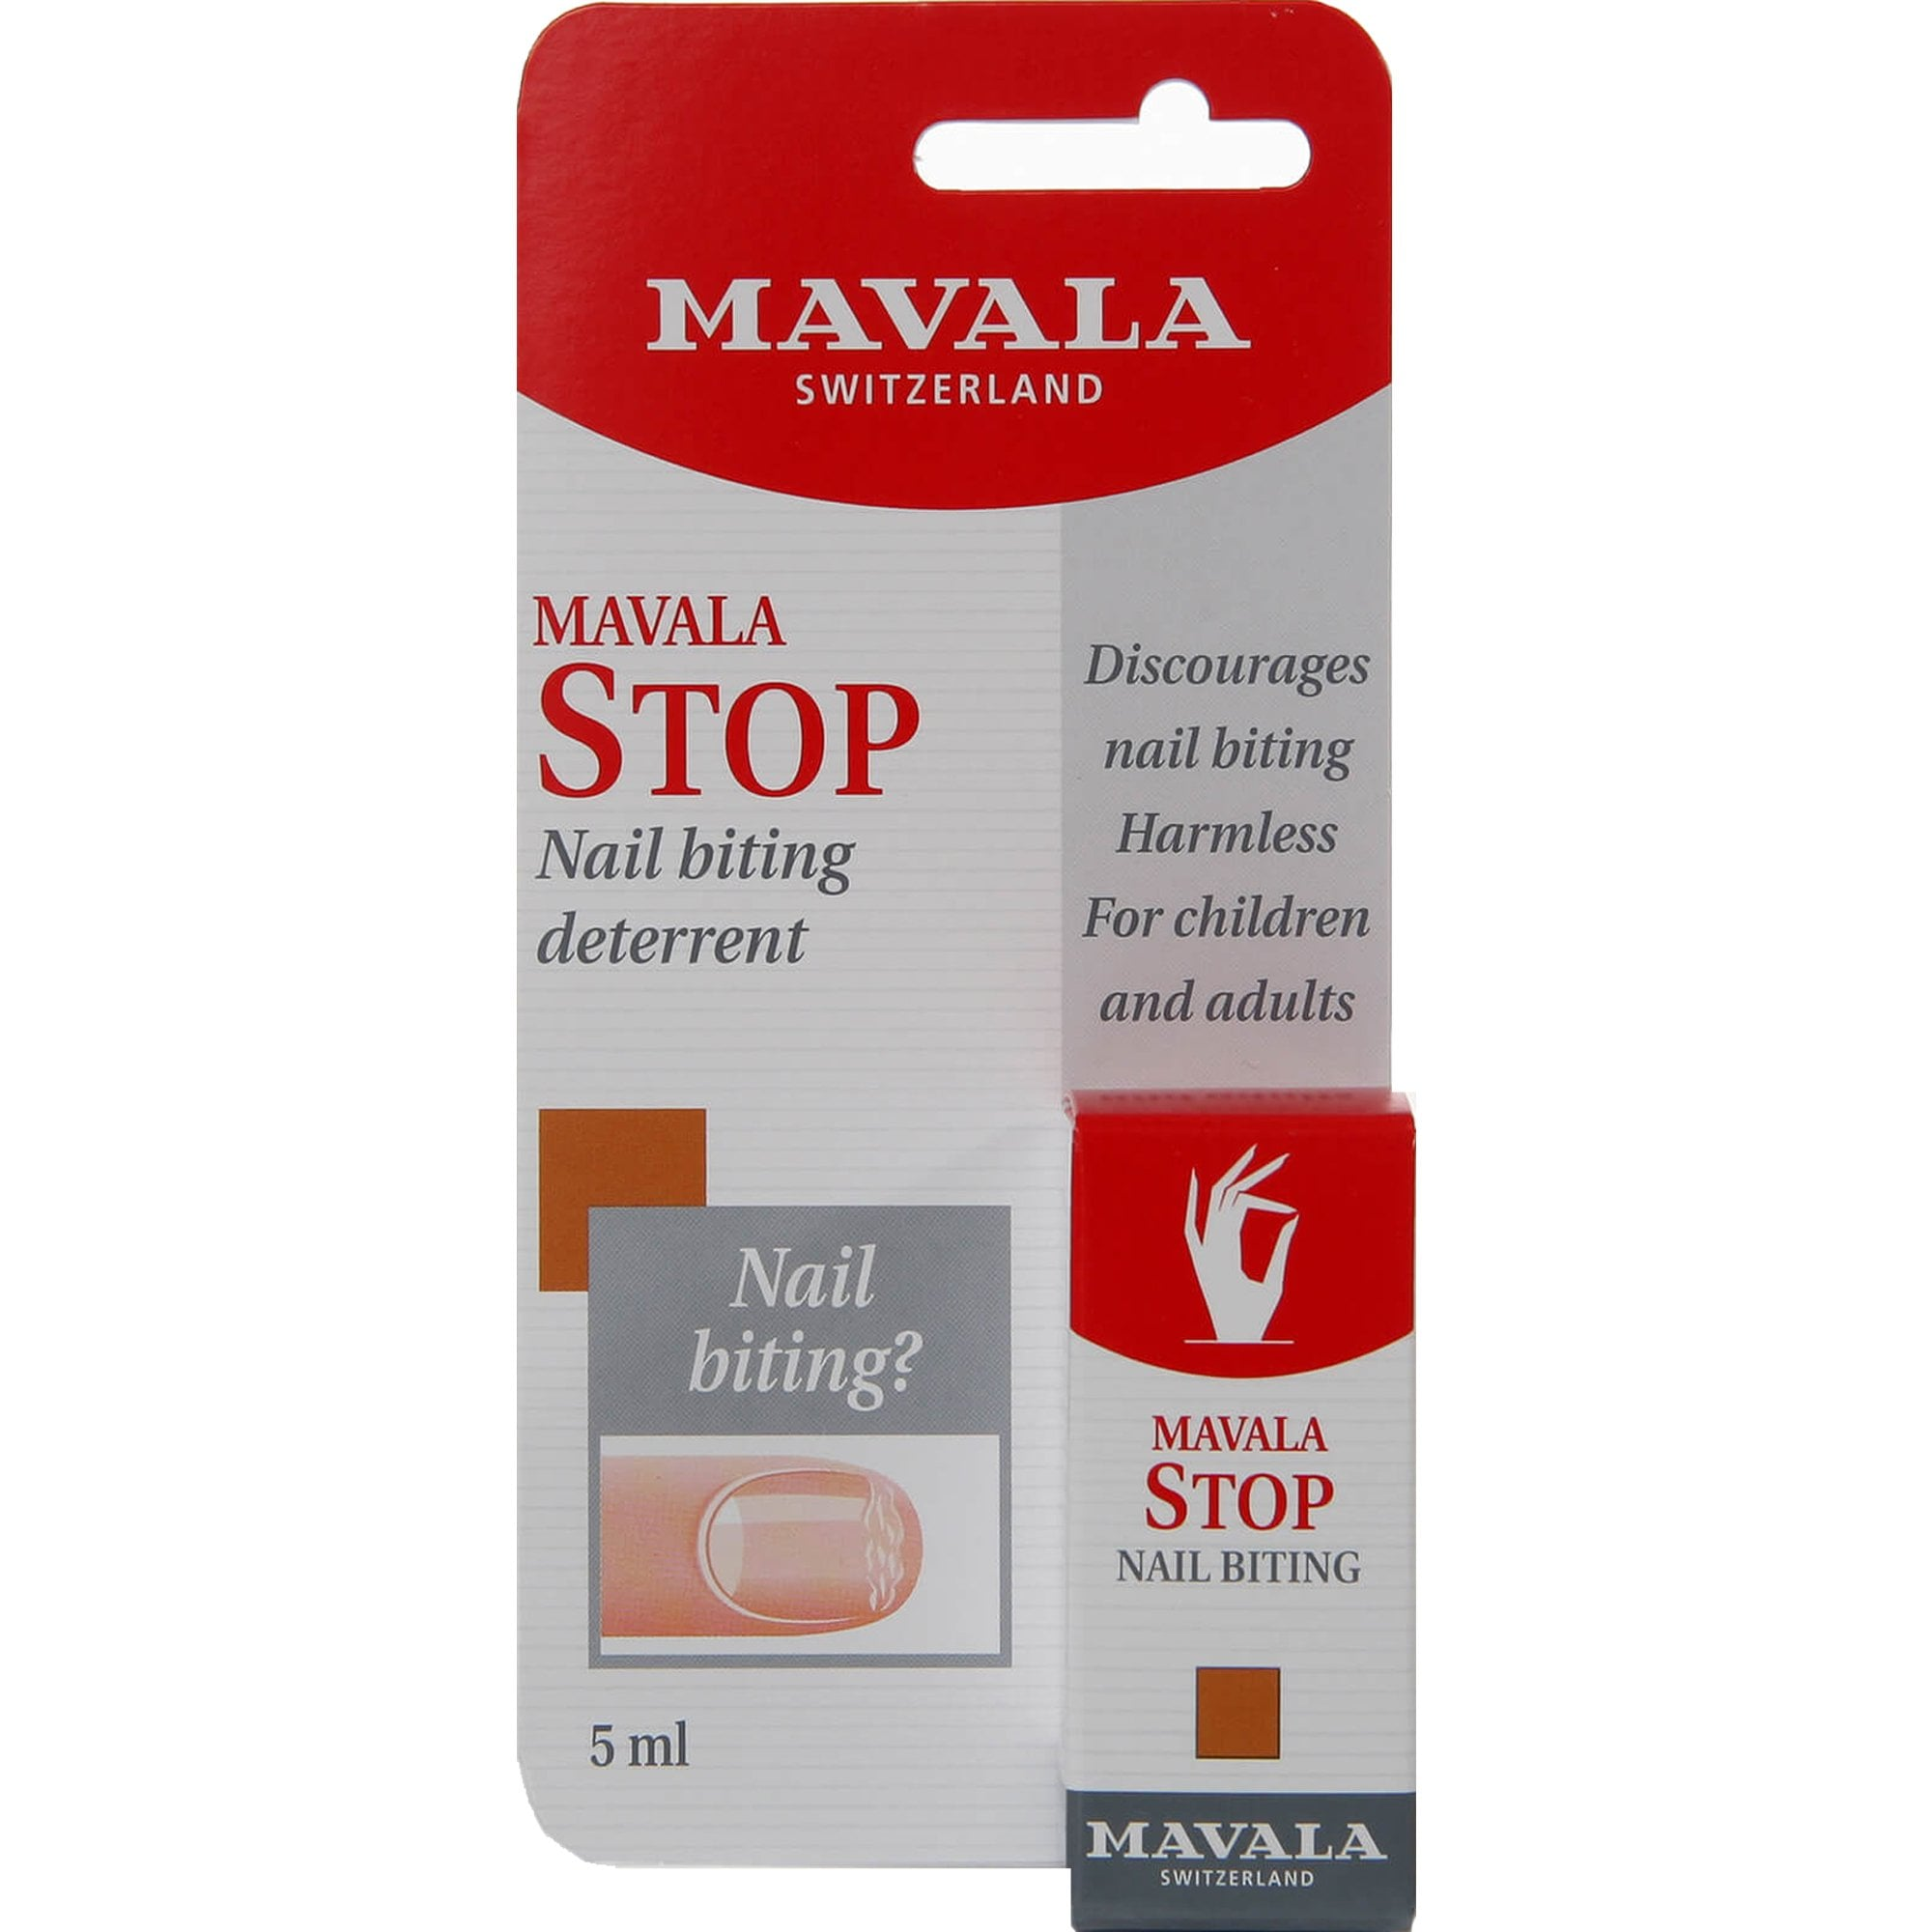 Mavala Stop Discourages Nail Biting and Thumb Sucking 10ml